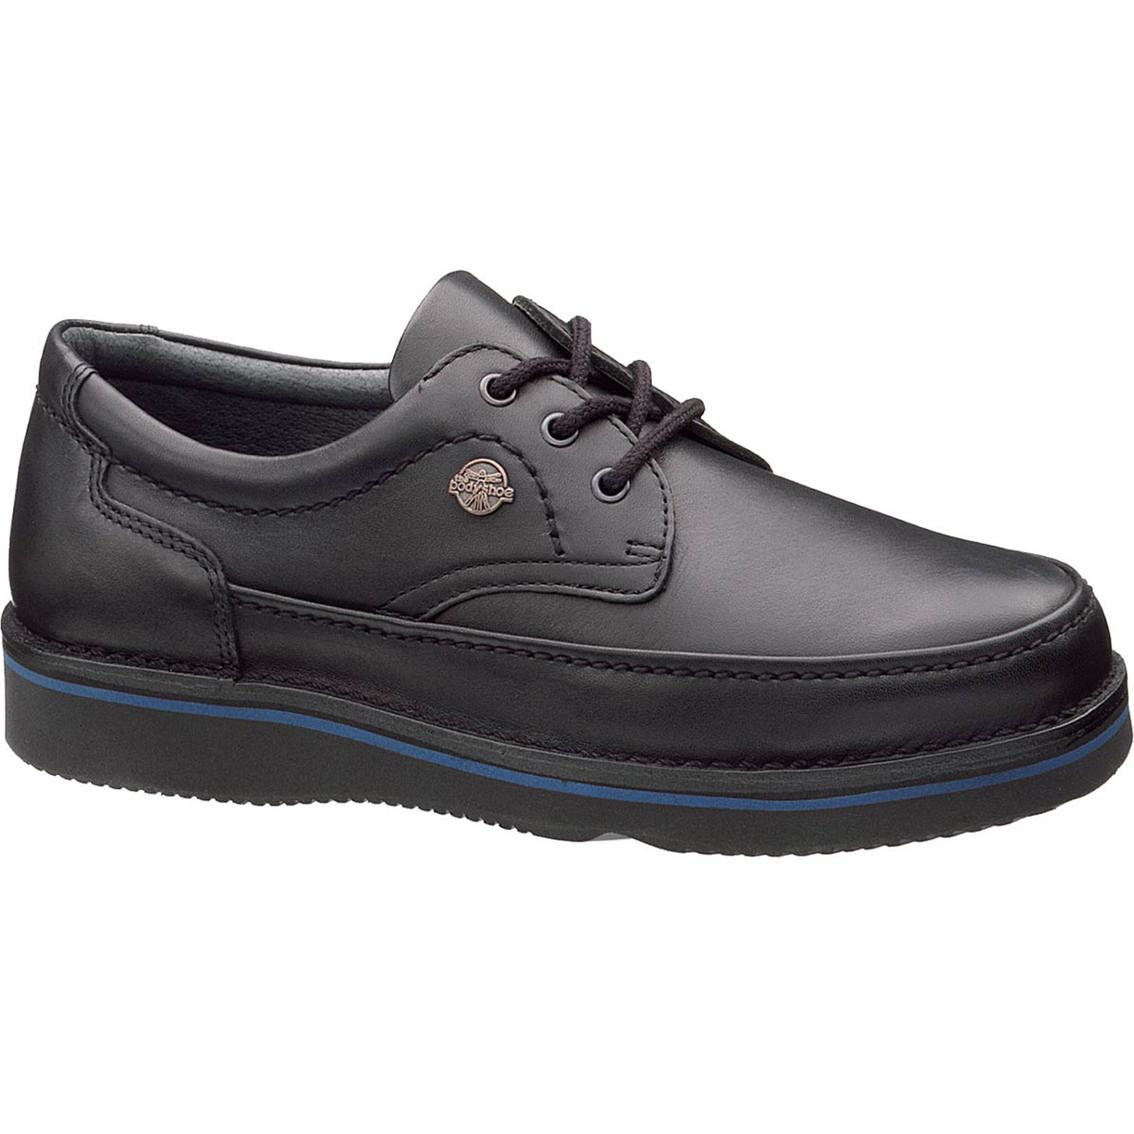 Hush Puppies Men's Mall Walker Shoes